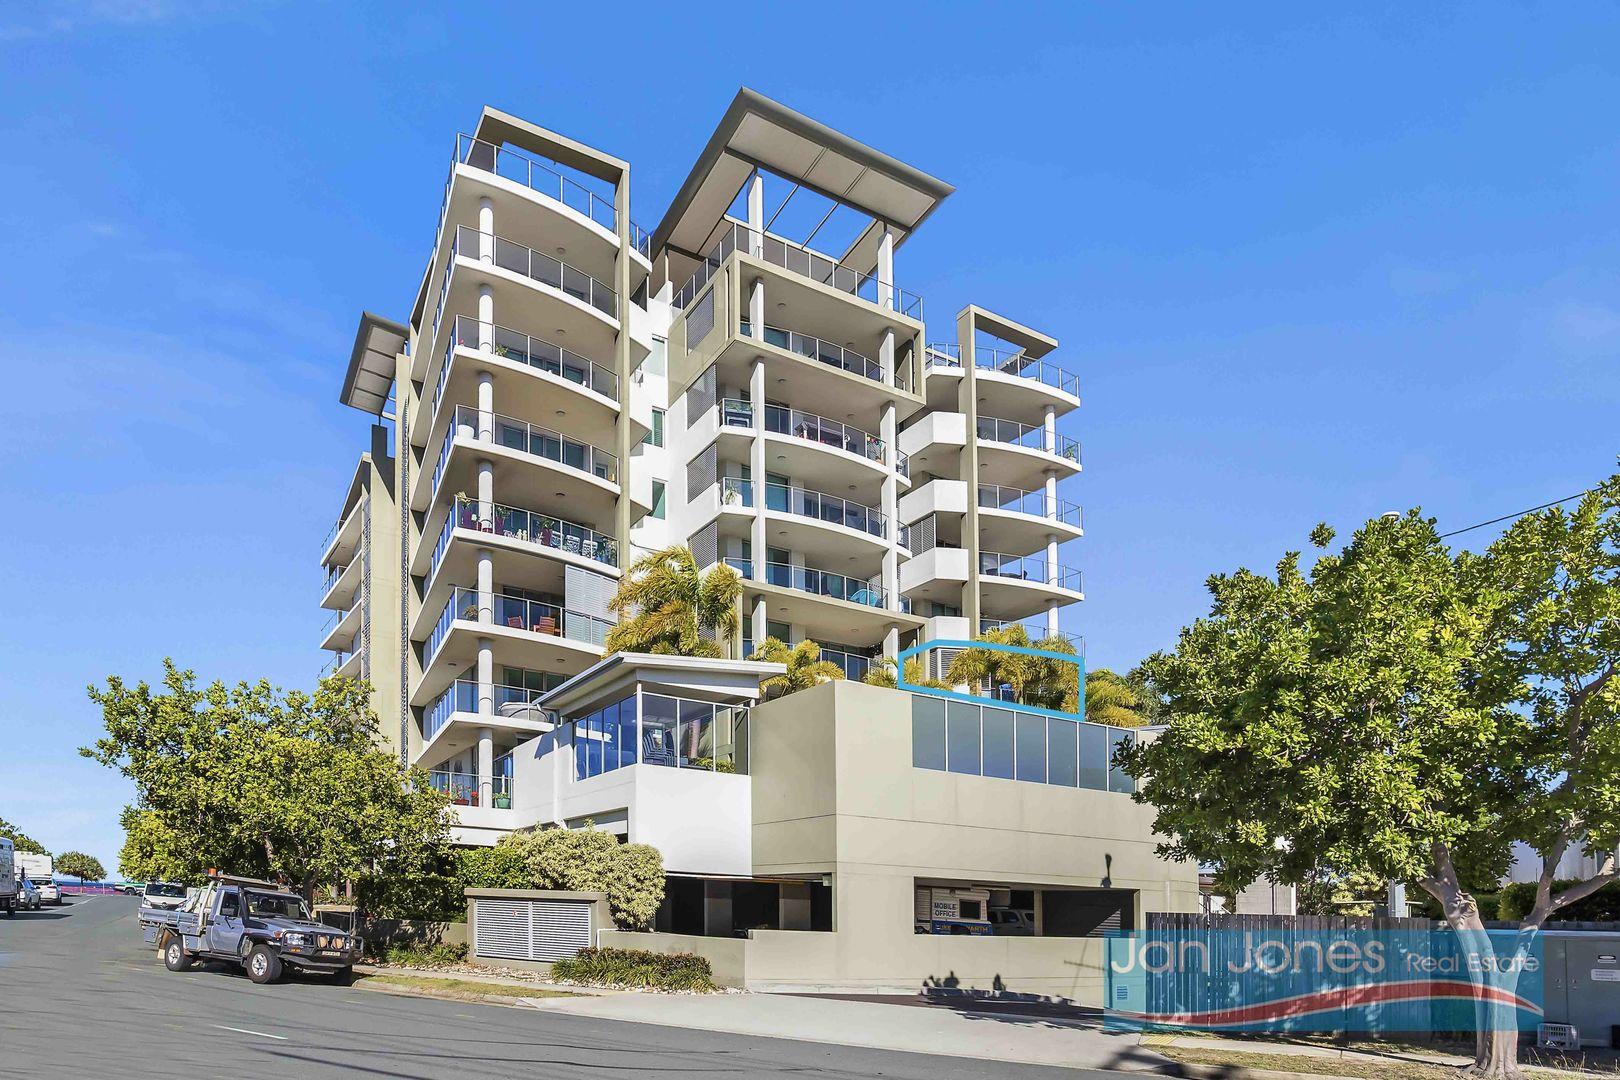 3 bedrooms Apartment / Unit / Flat in Unit 18/3 Angus St CLONTARF QLD, 4019